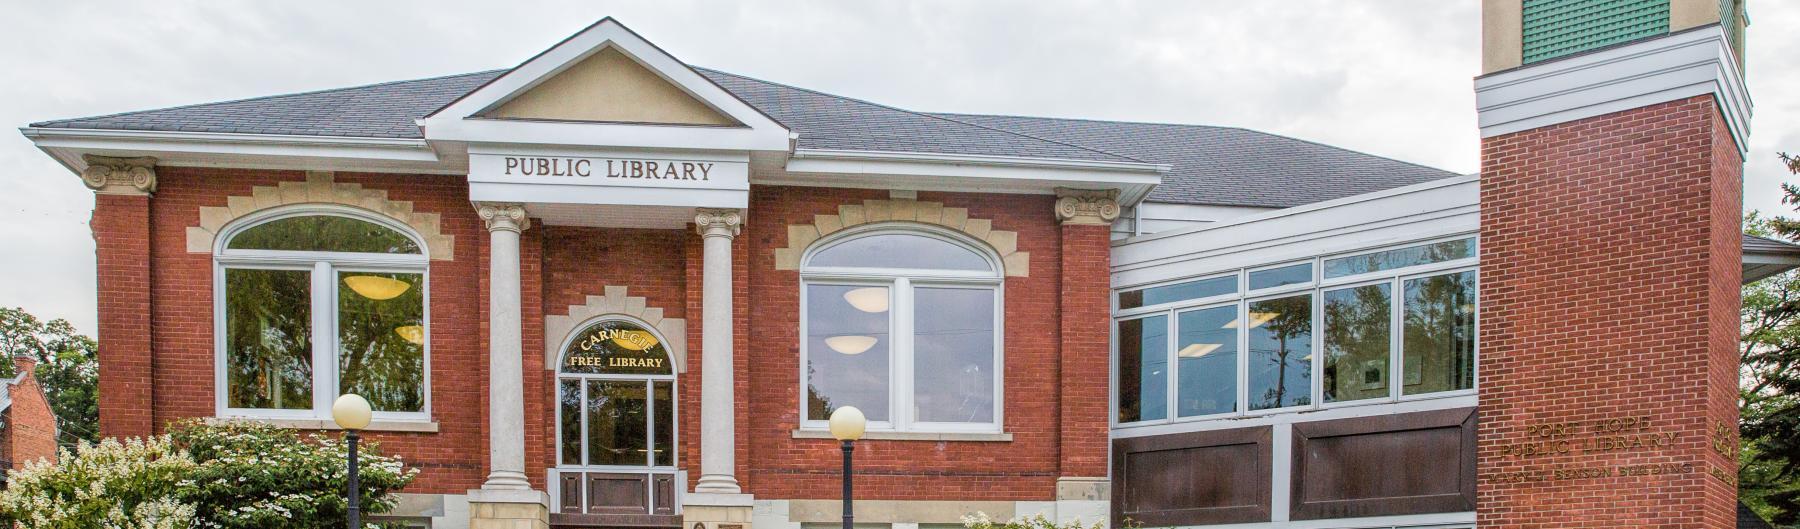 Port Hope Public Library circa 2017